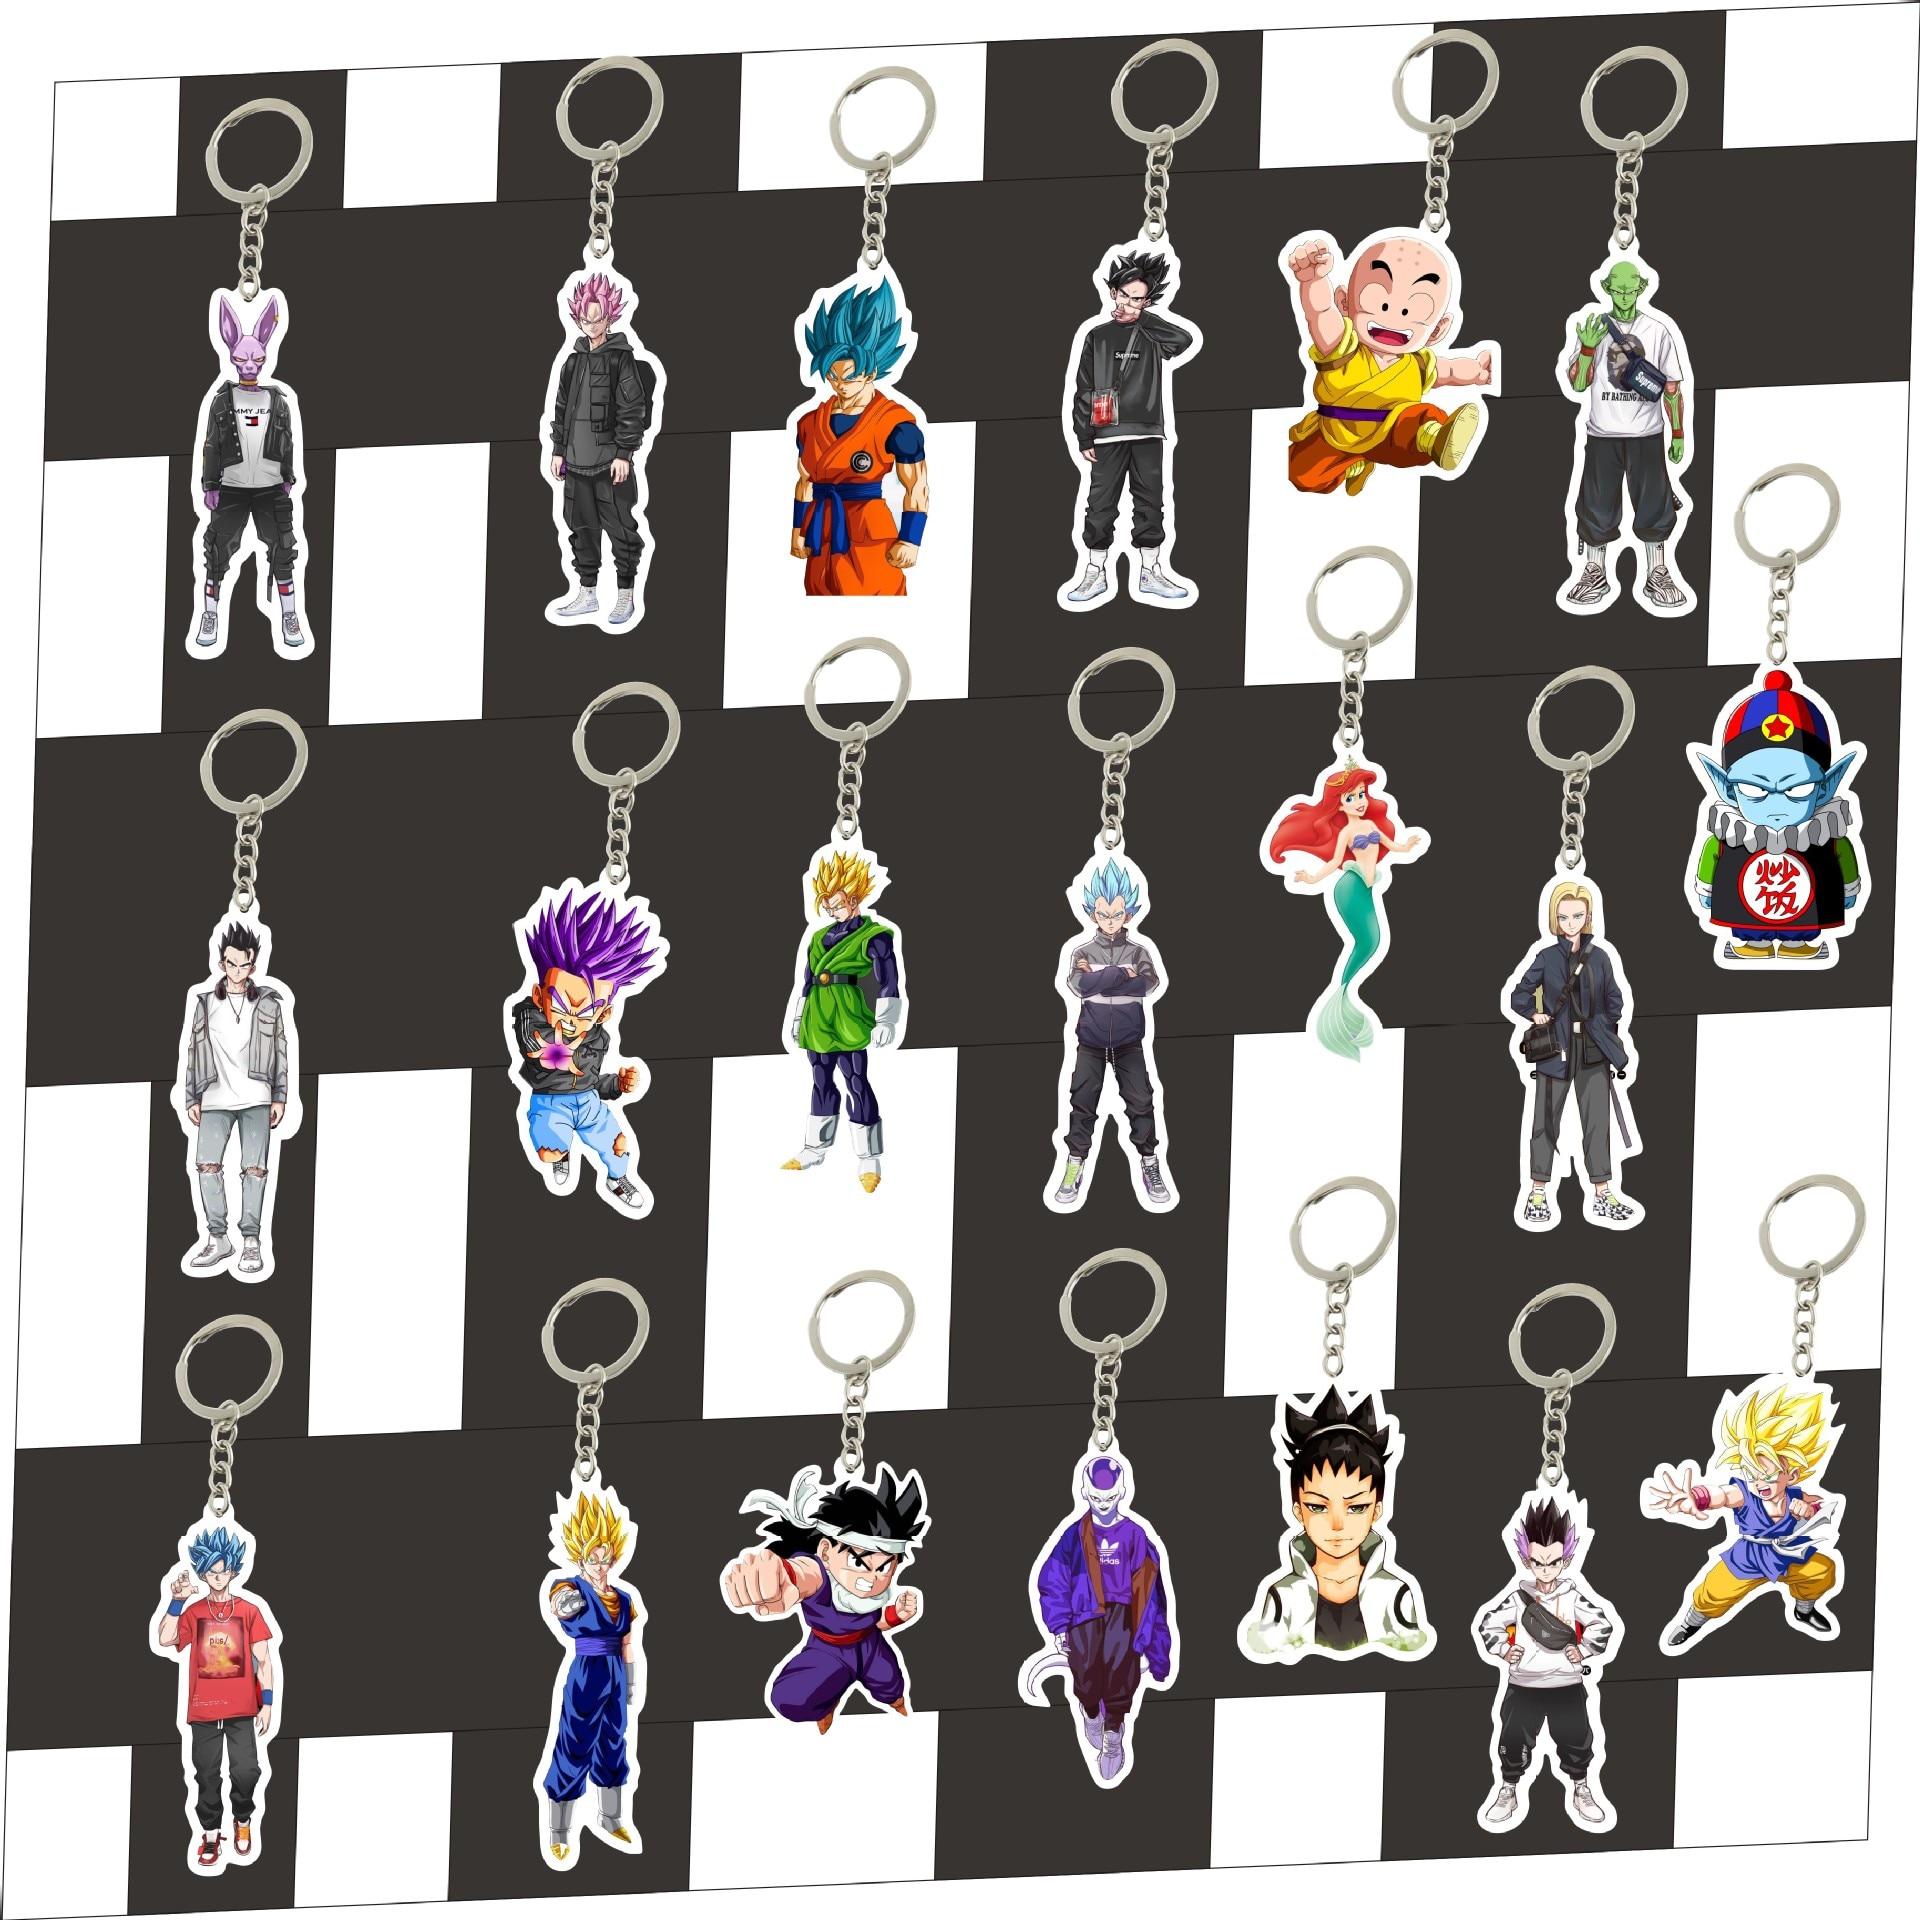 Acrylic Keychain Dragon Ball Sun Wukong Accessories Anime Cartoon Circle Gift Cute Pendant